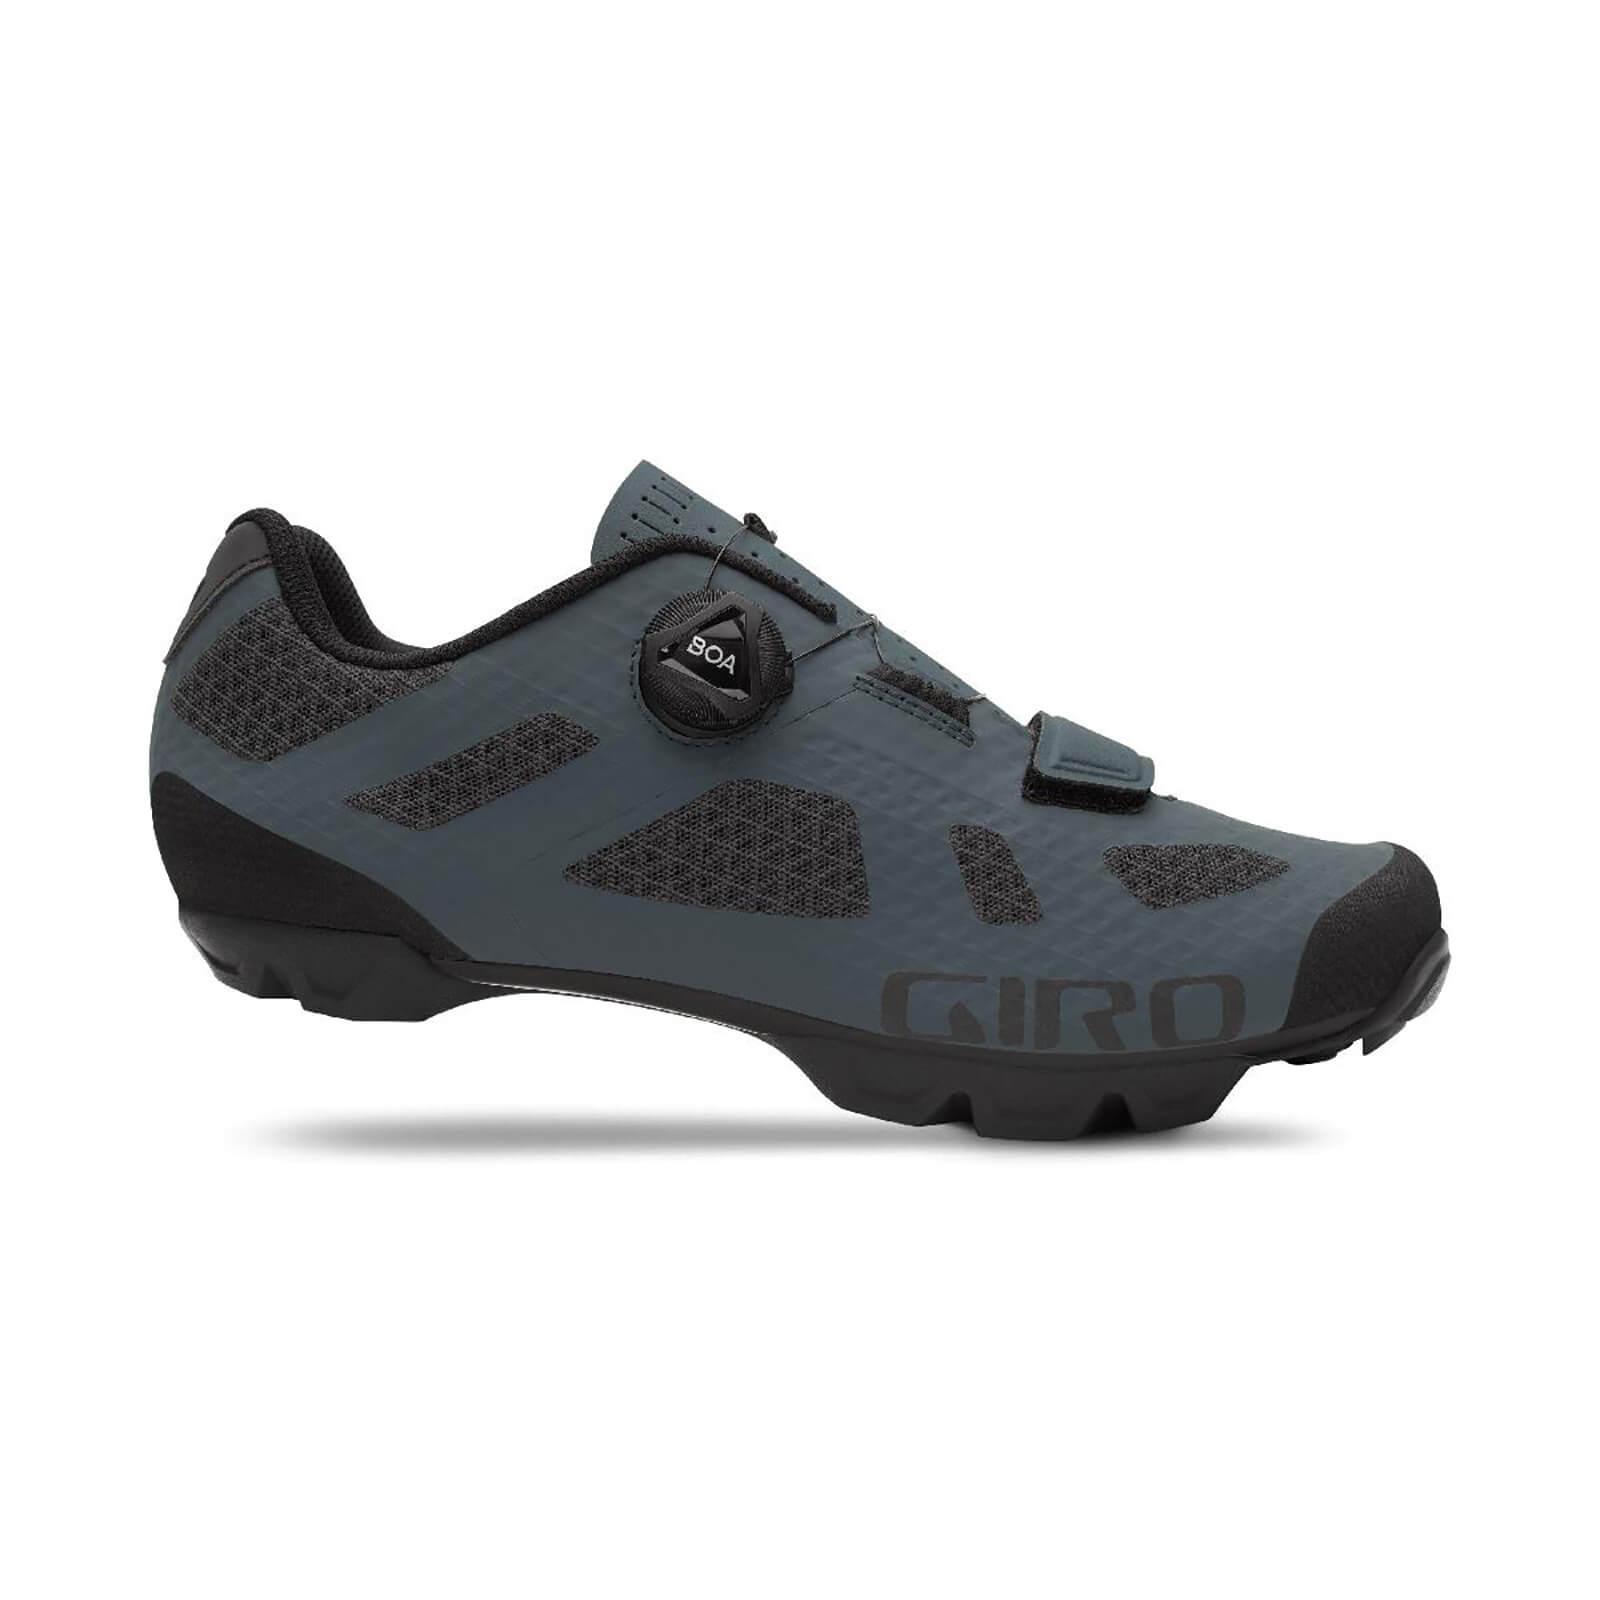 Hjc Ibex 2.0 Road Helmet - M - White Line Grey